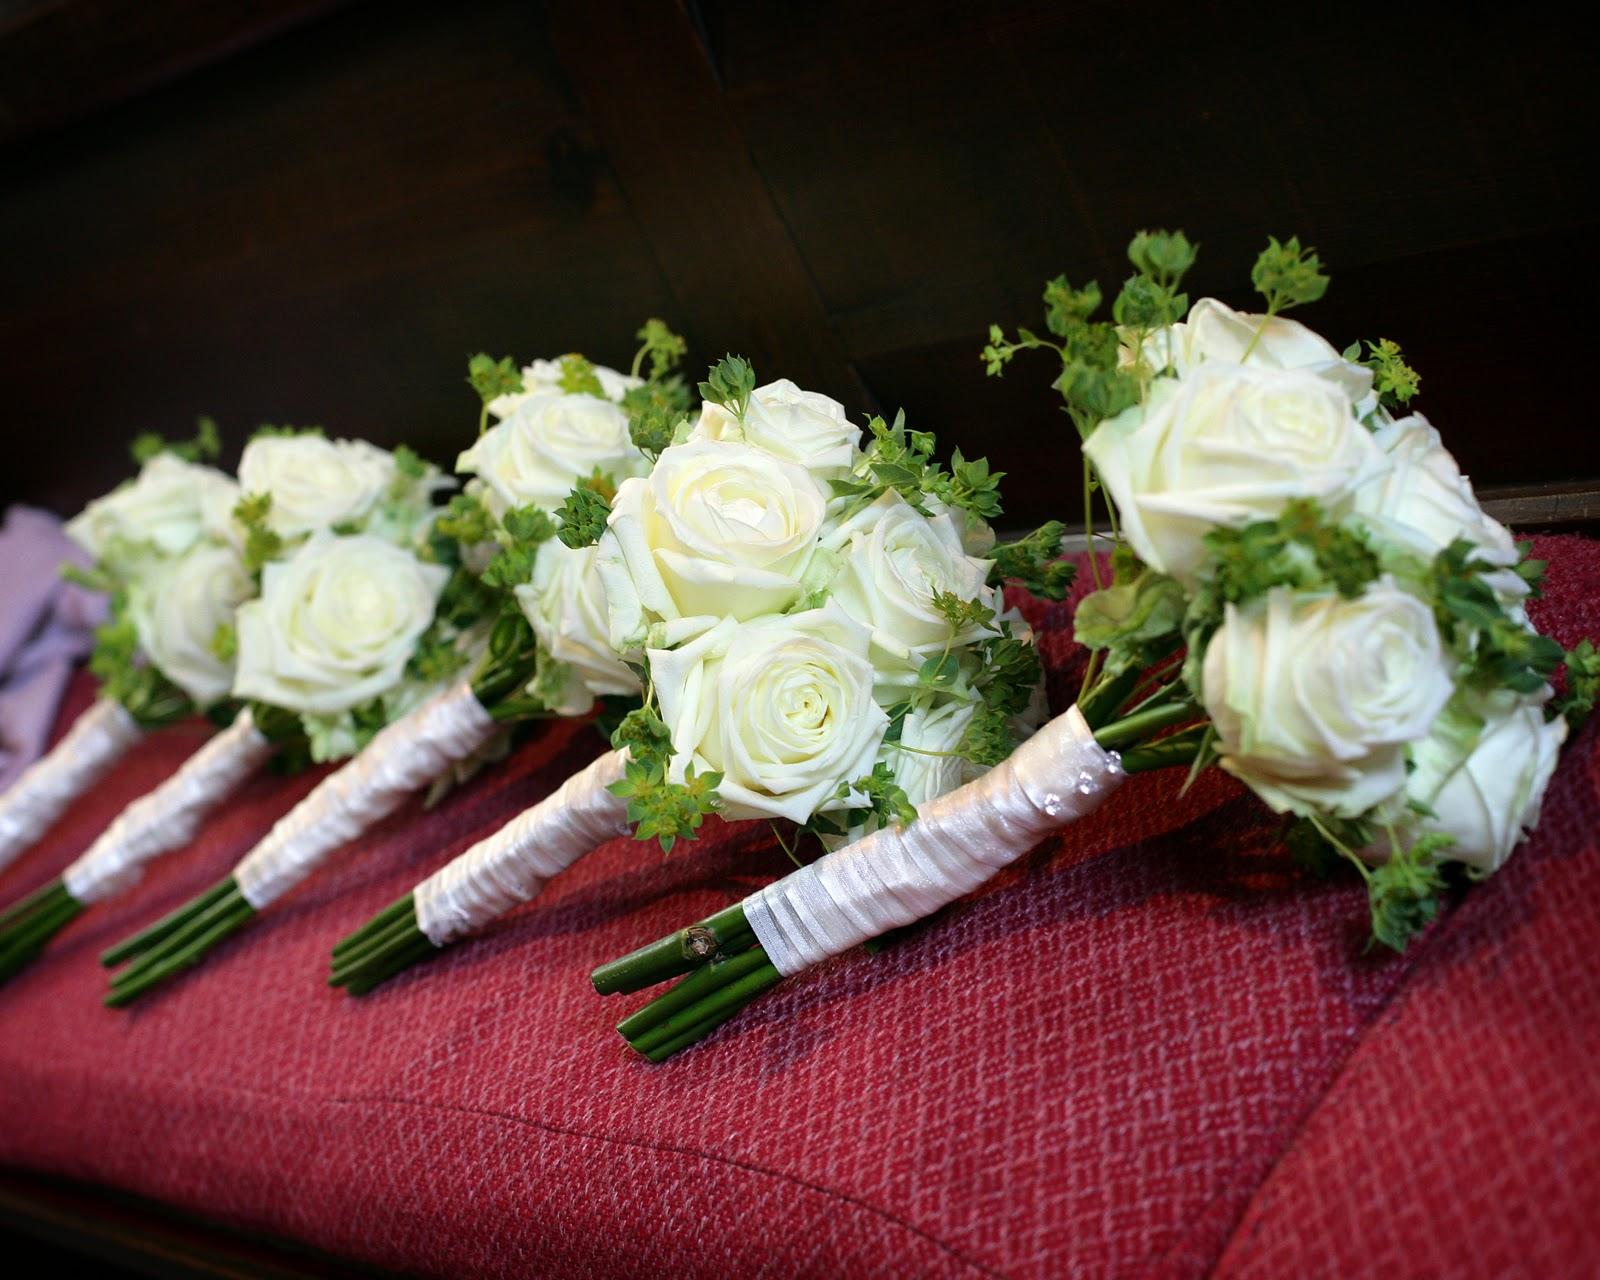 Blush Bespoke Flowers Blog How much do Wedding Flowers cost